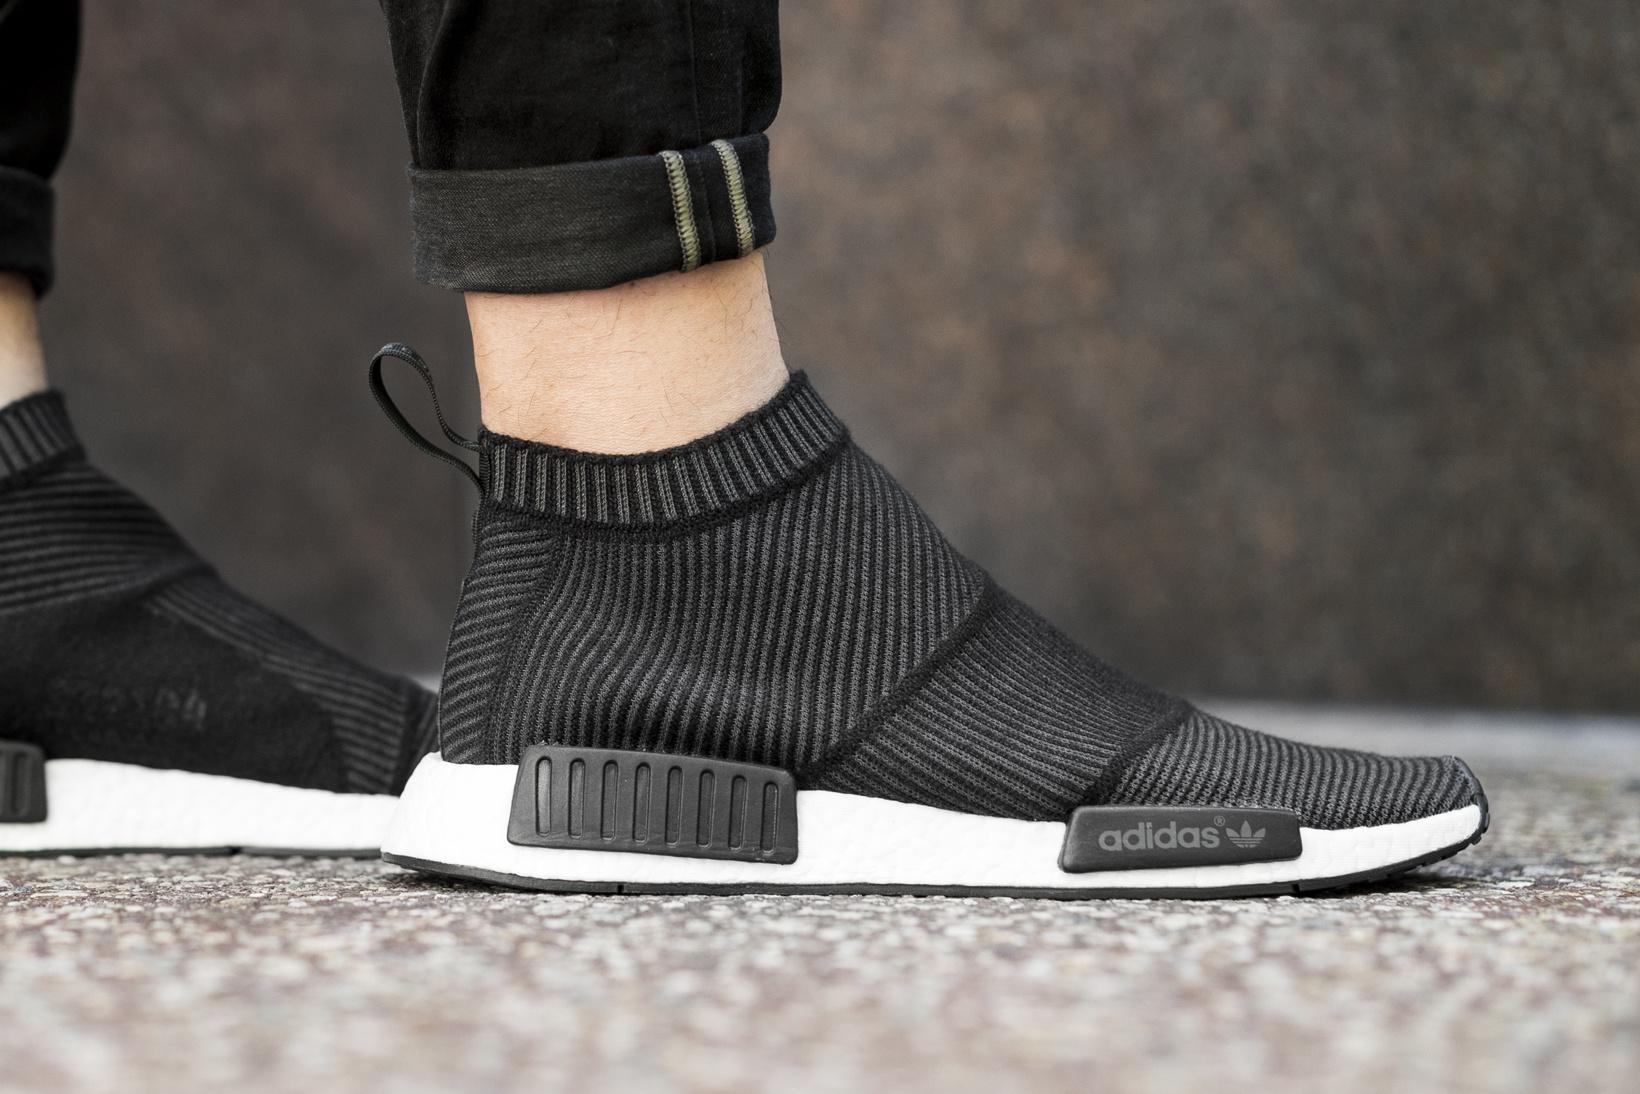 The adidas WMNS NMD City Sock 2 Black White Drops Tomorrow